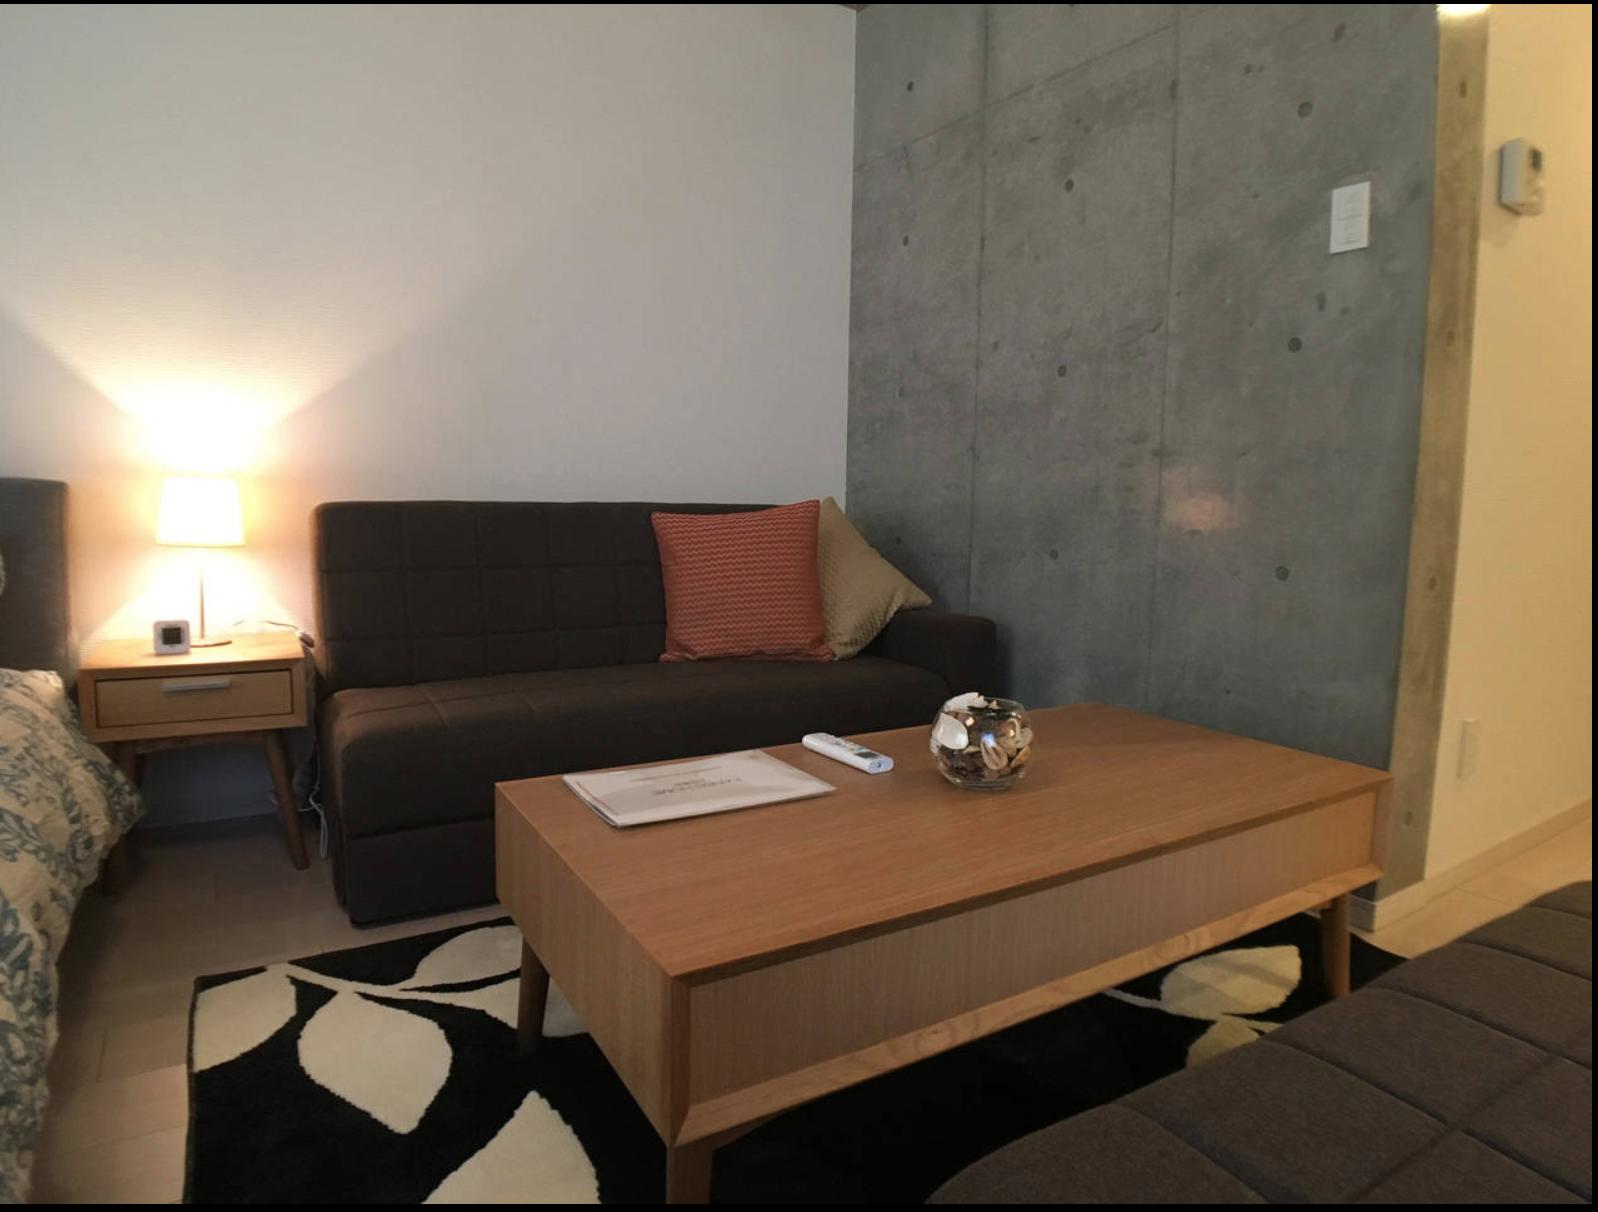 1-bedroom apartment Regalia Minami-Azabu #101